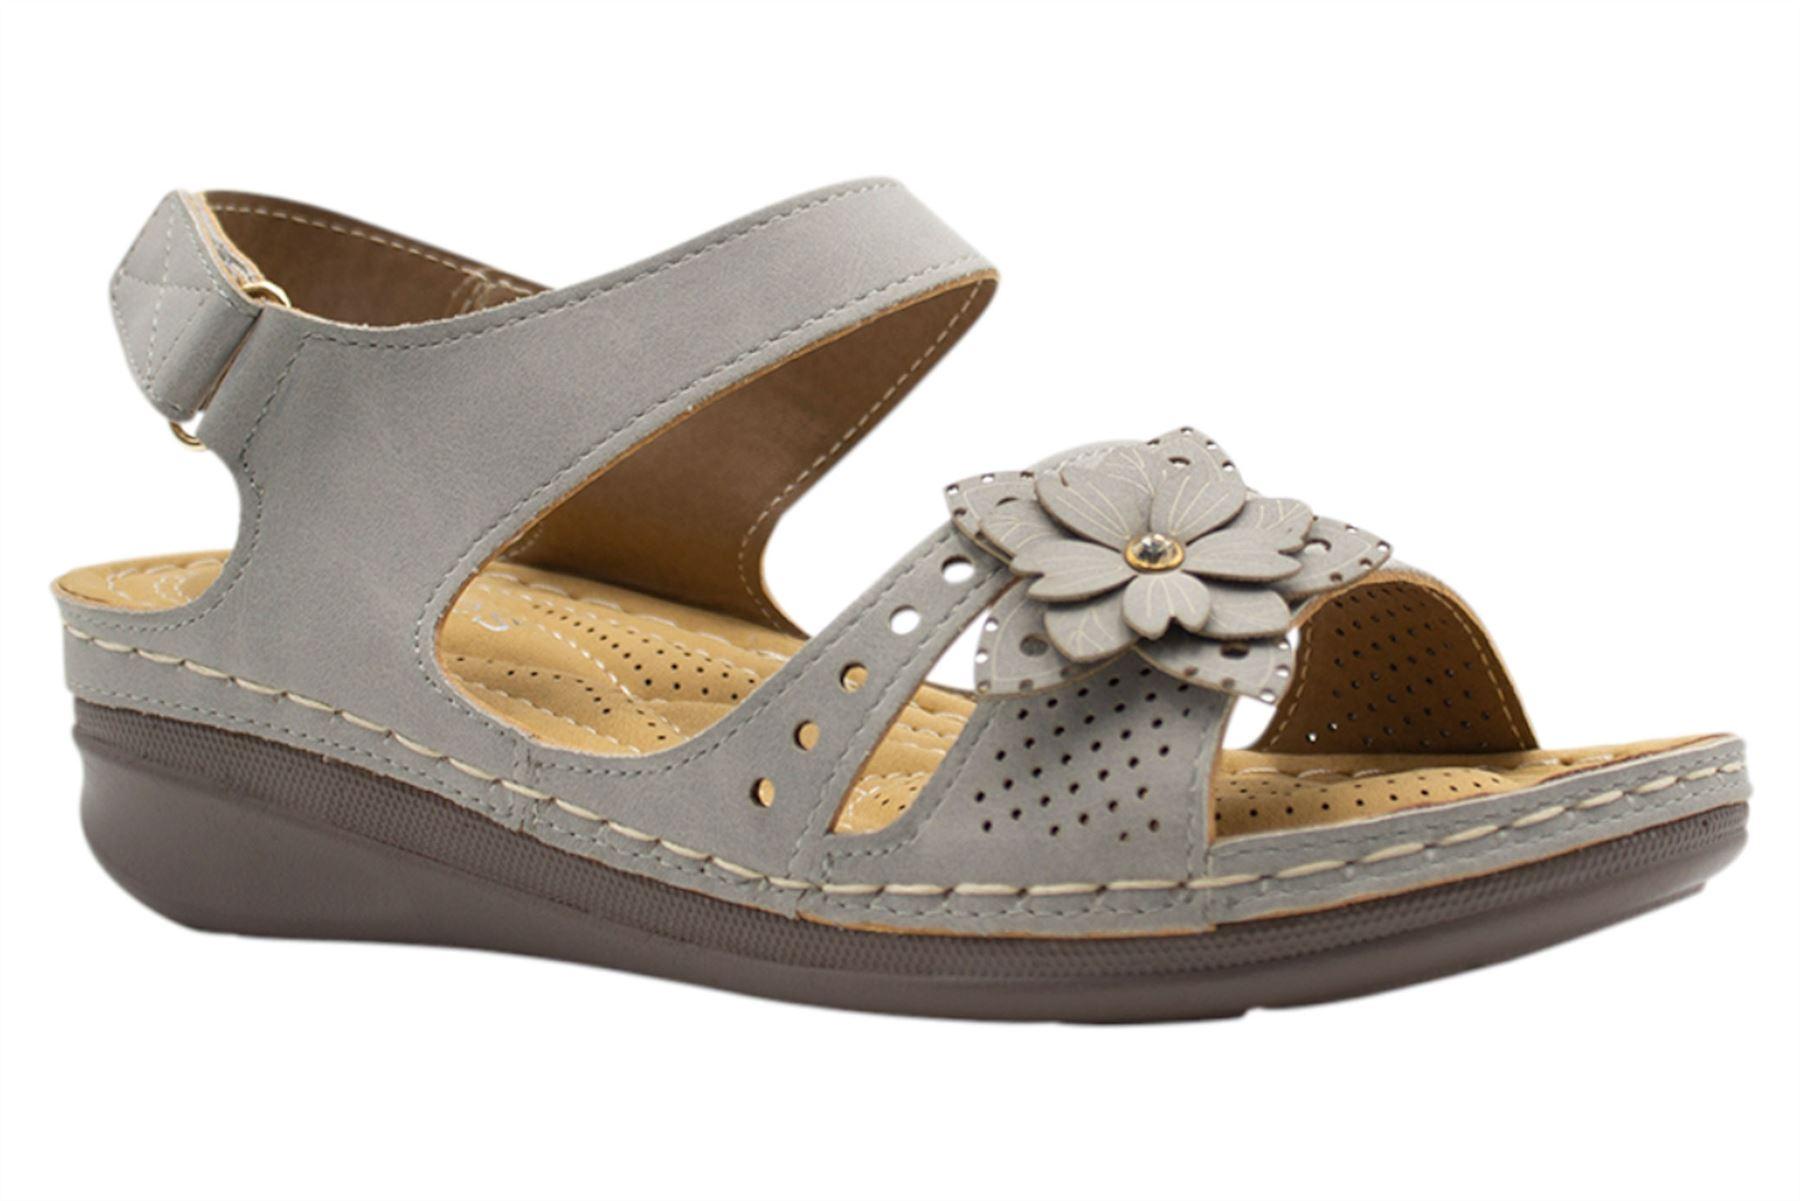 Ladies-Wedge-Heel-Sandal-Womens-Comfort-Cushion-Strapy-Summer-Shoes miniatura 26